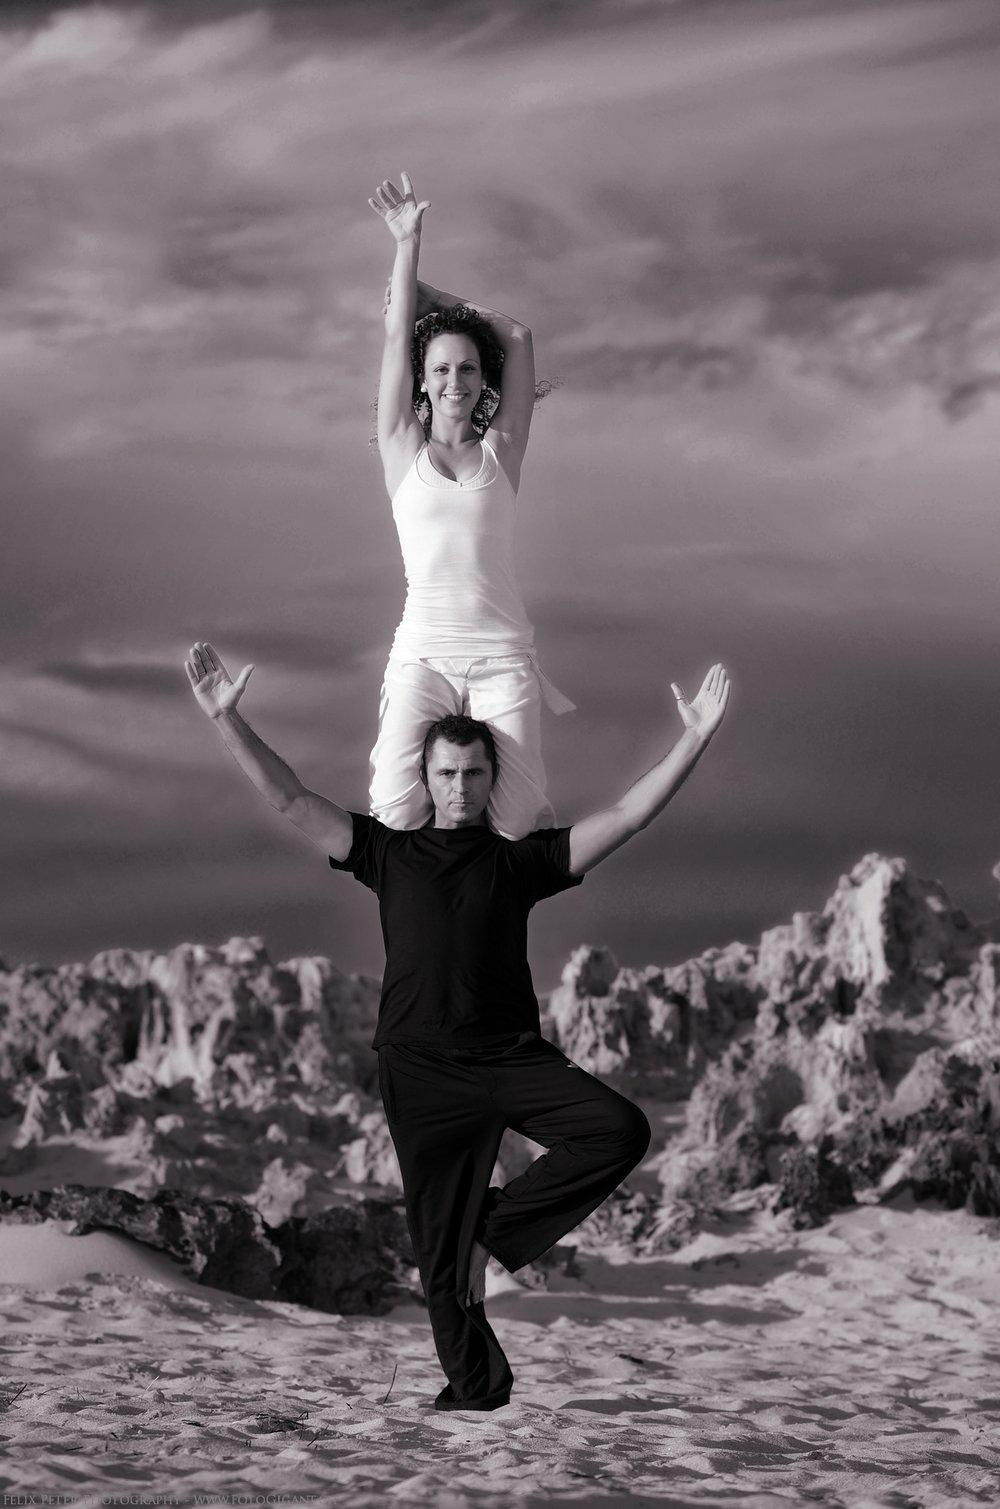 Felix-Peter-Yoga-Pilates-Dance-Fotografie_Bern_065.jpg